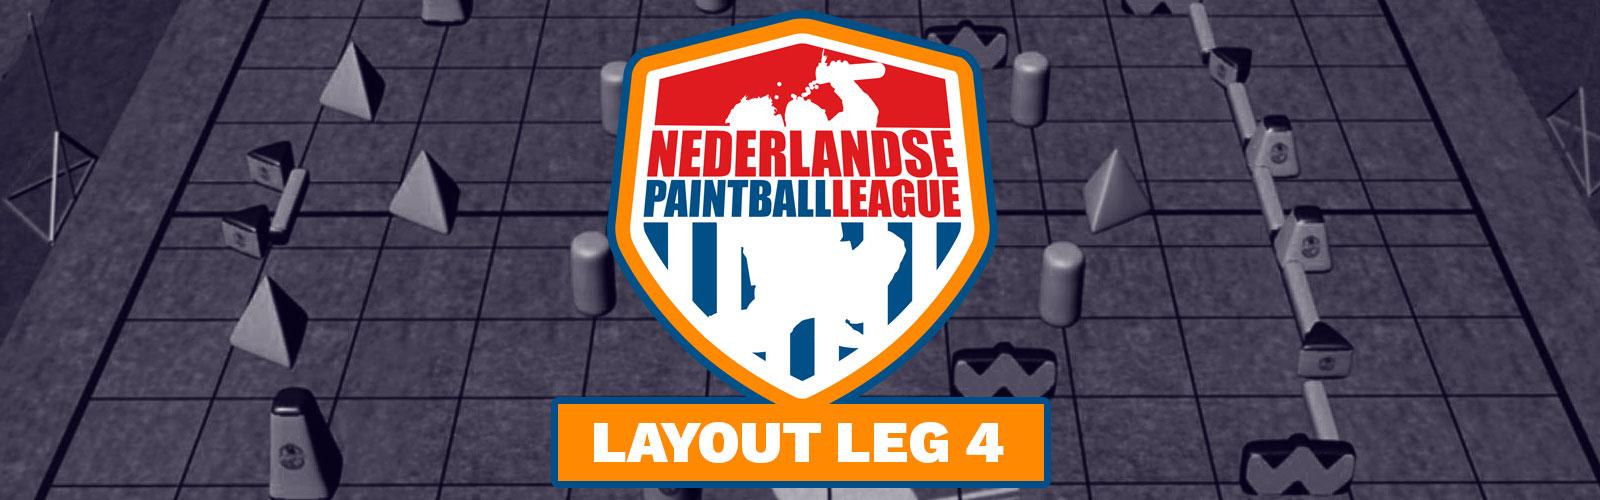 Lay Out Leg4